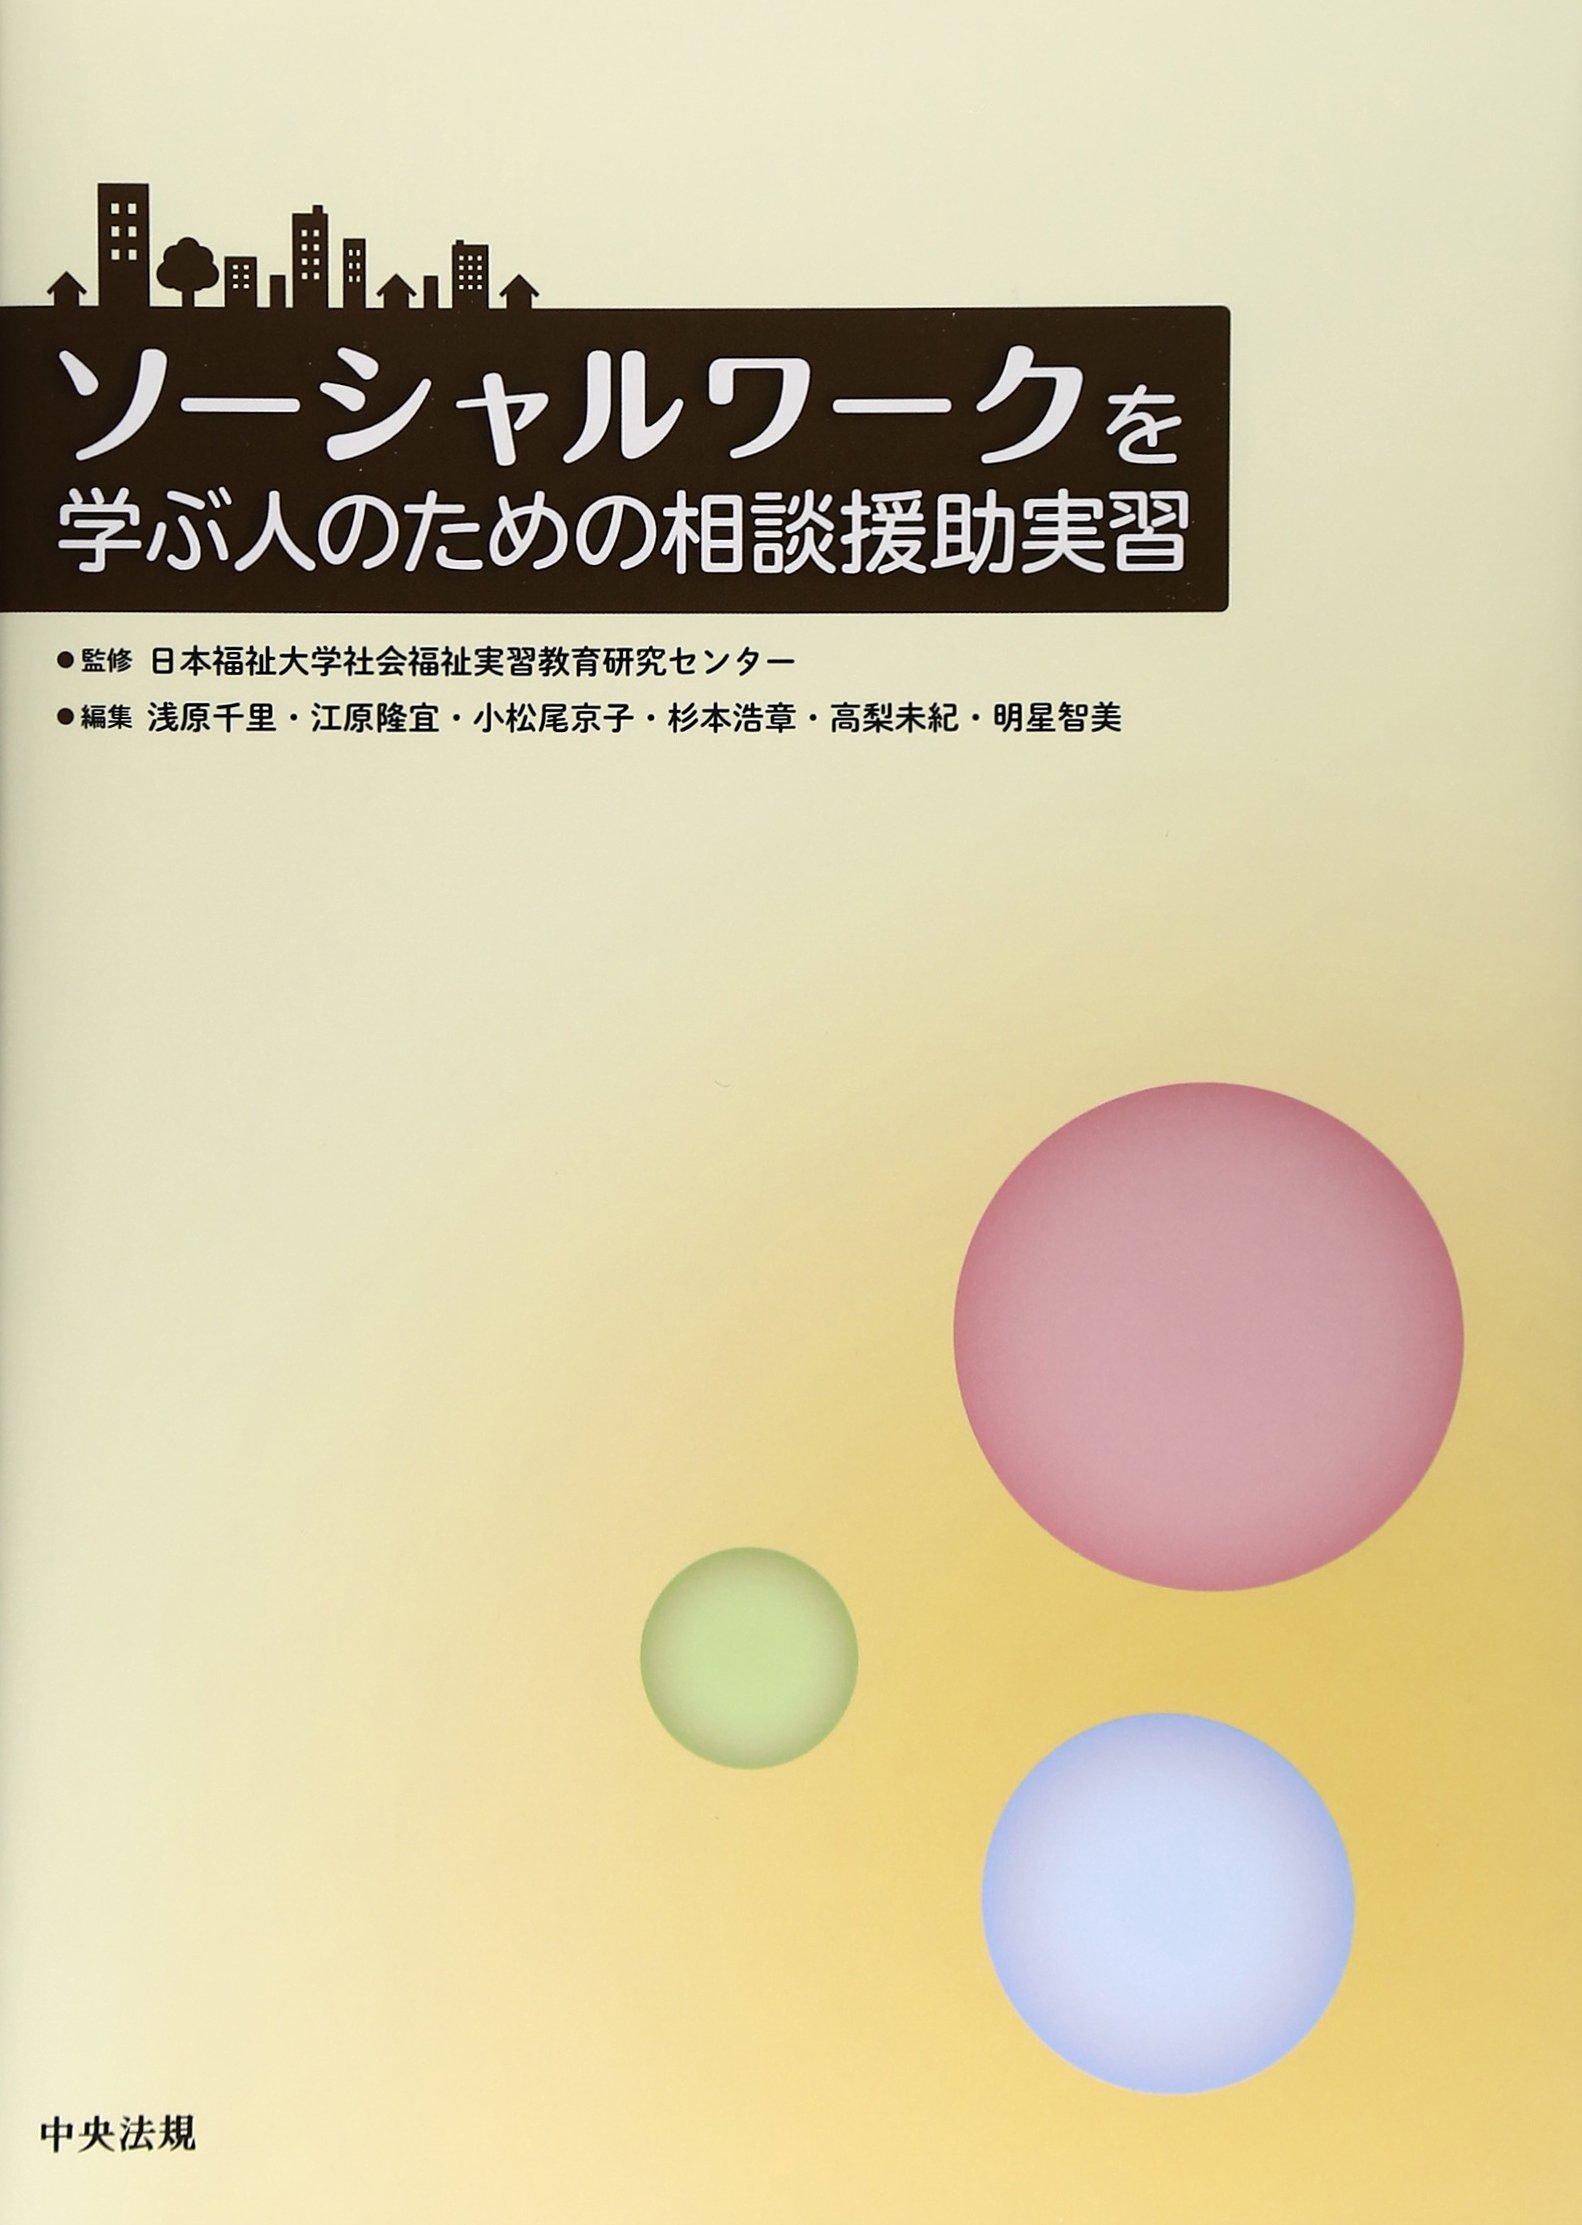 Sōsharu wāku o manabu hito no tame no sōdan enjo jisshū pdf epub